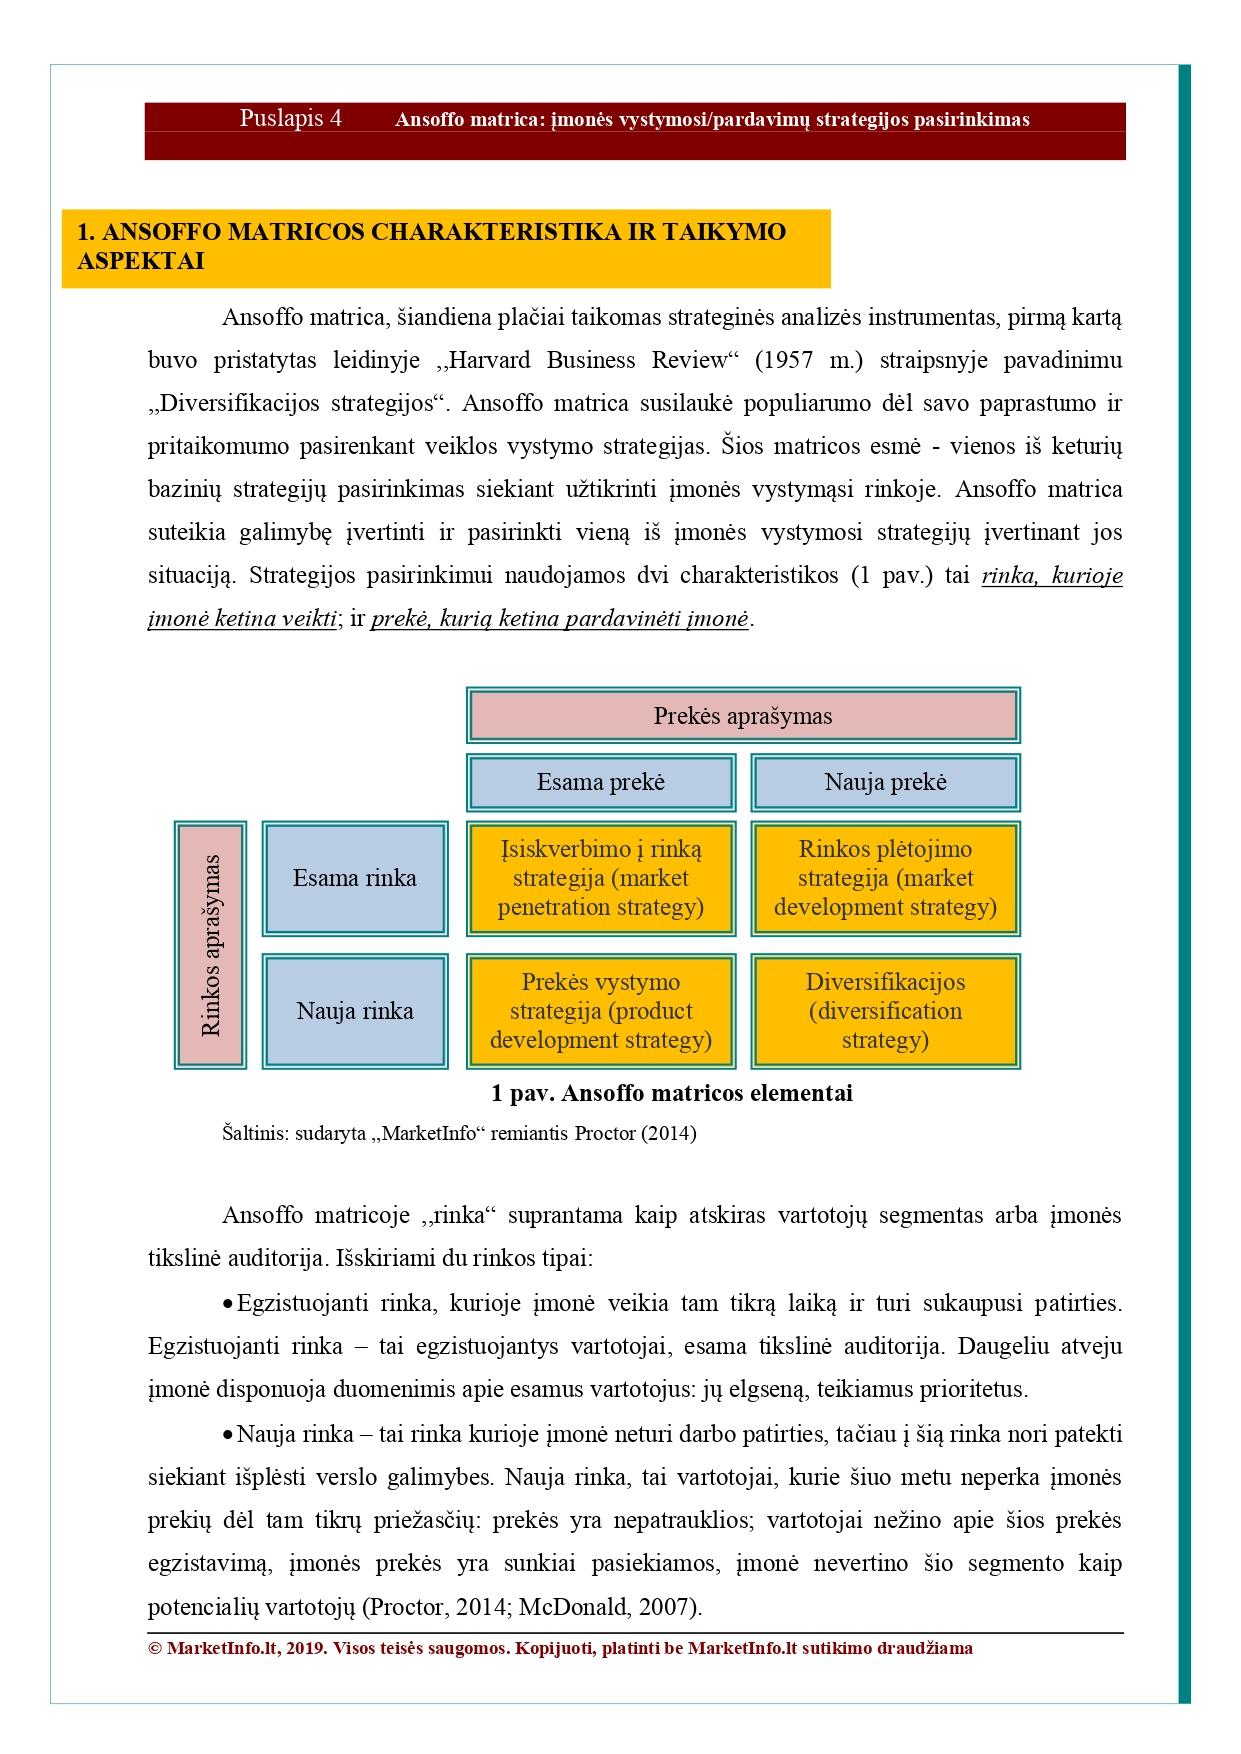 diversifikacijos strategija ansoff matrica